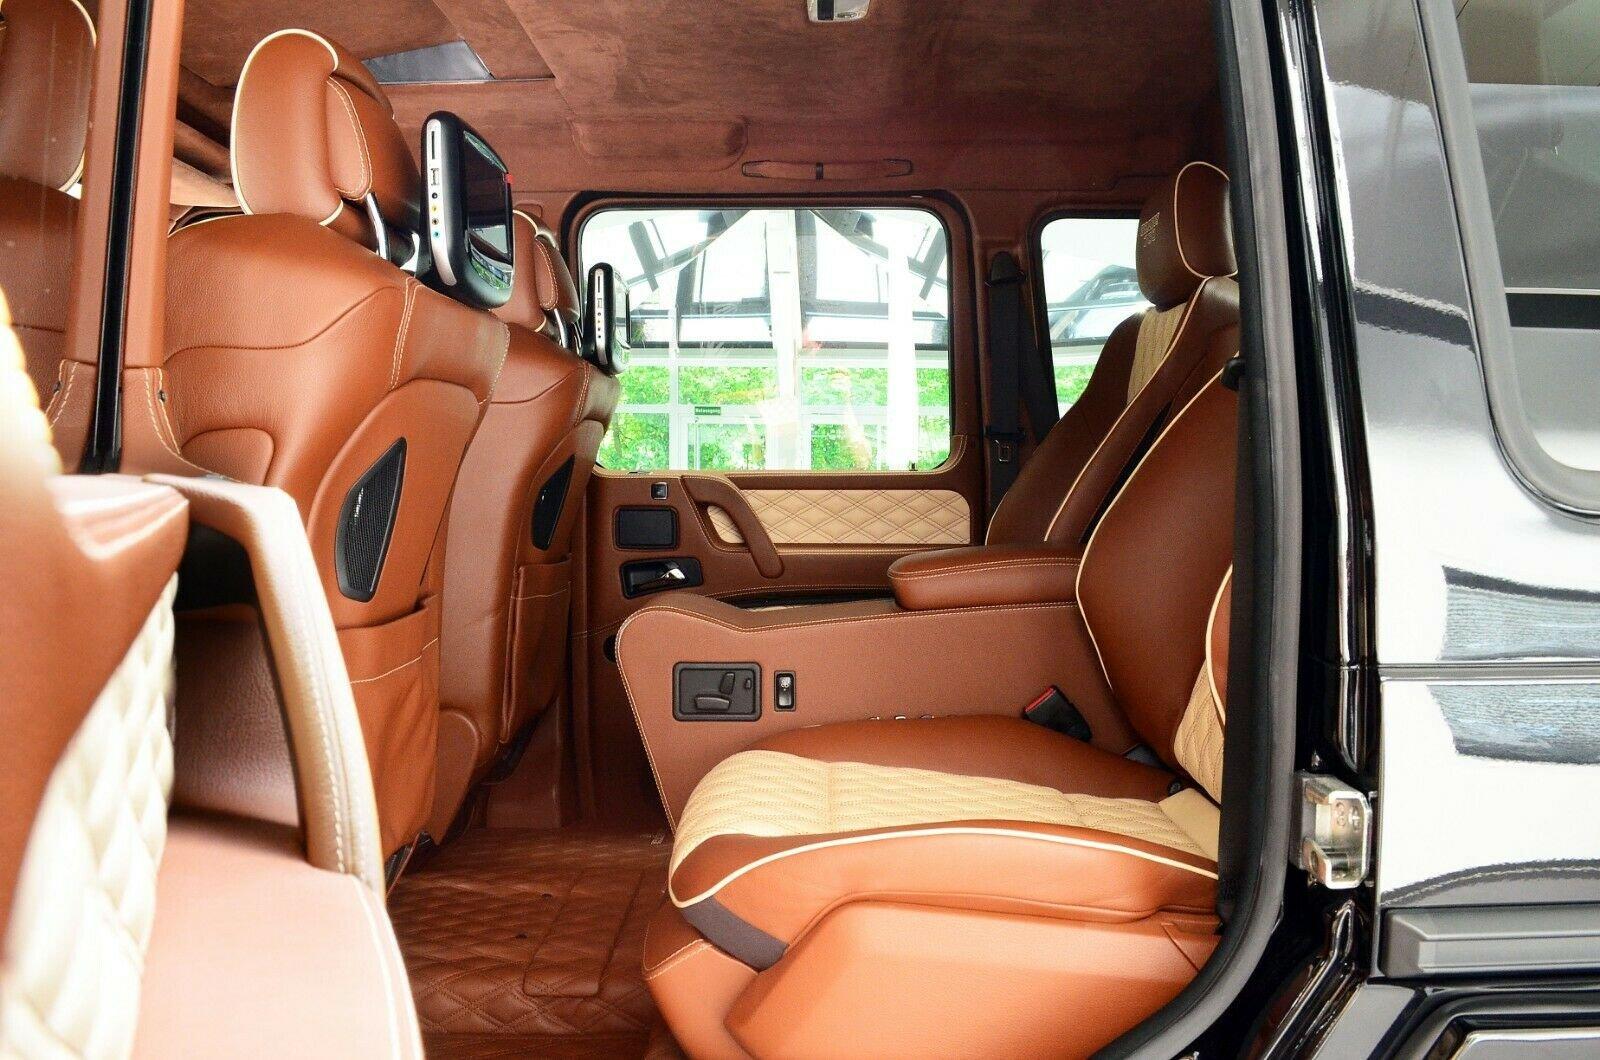 Mercedes-Benz G 63 AMG 6x6 Brabus700 - 1of15 (2)